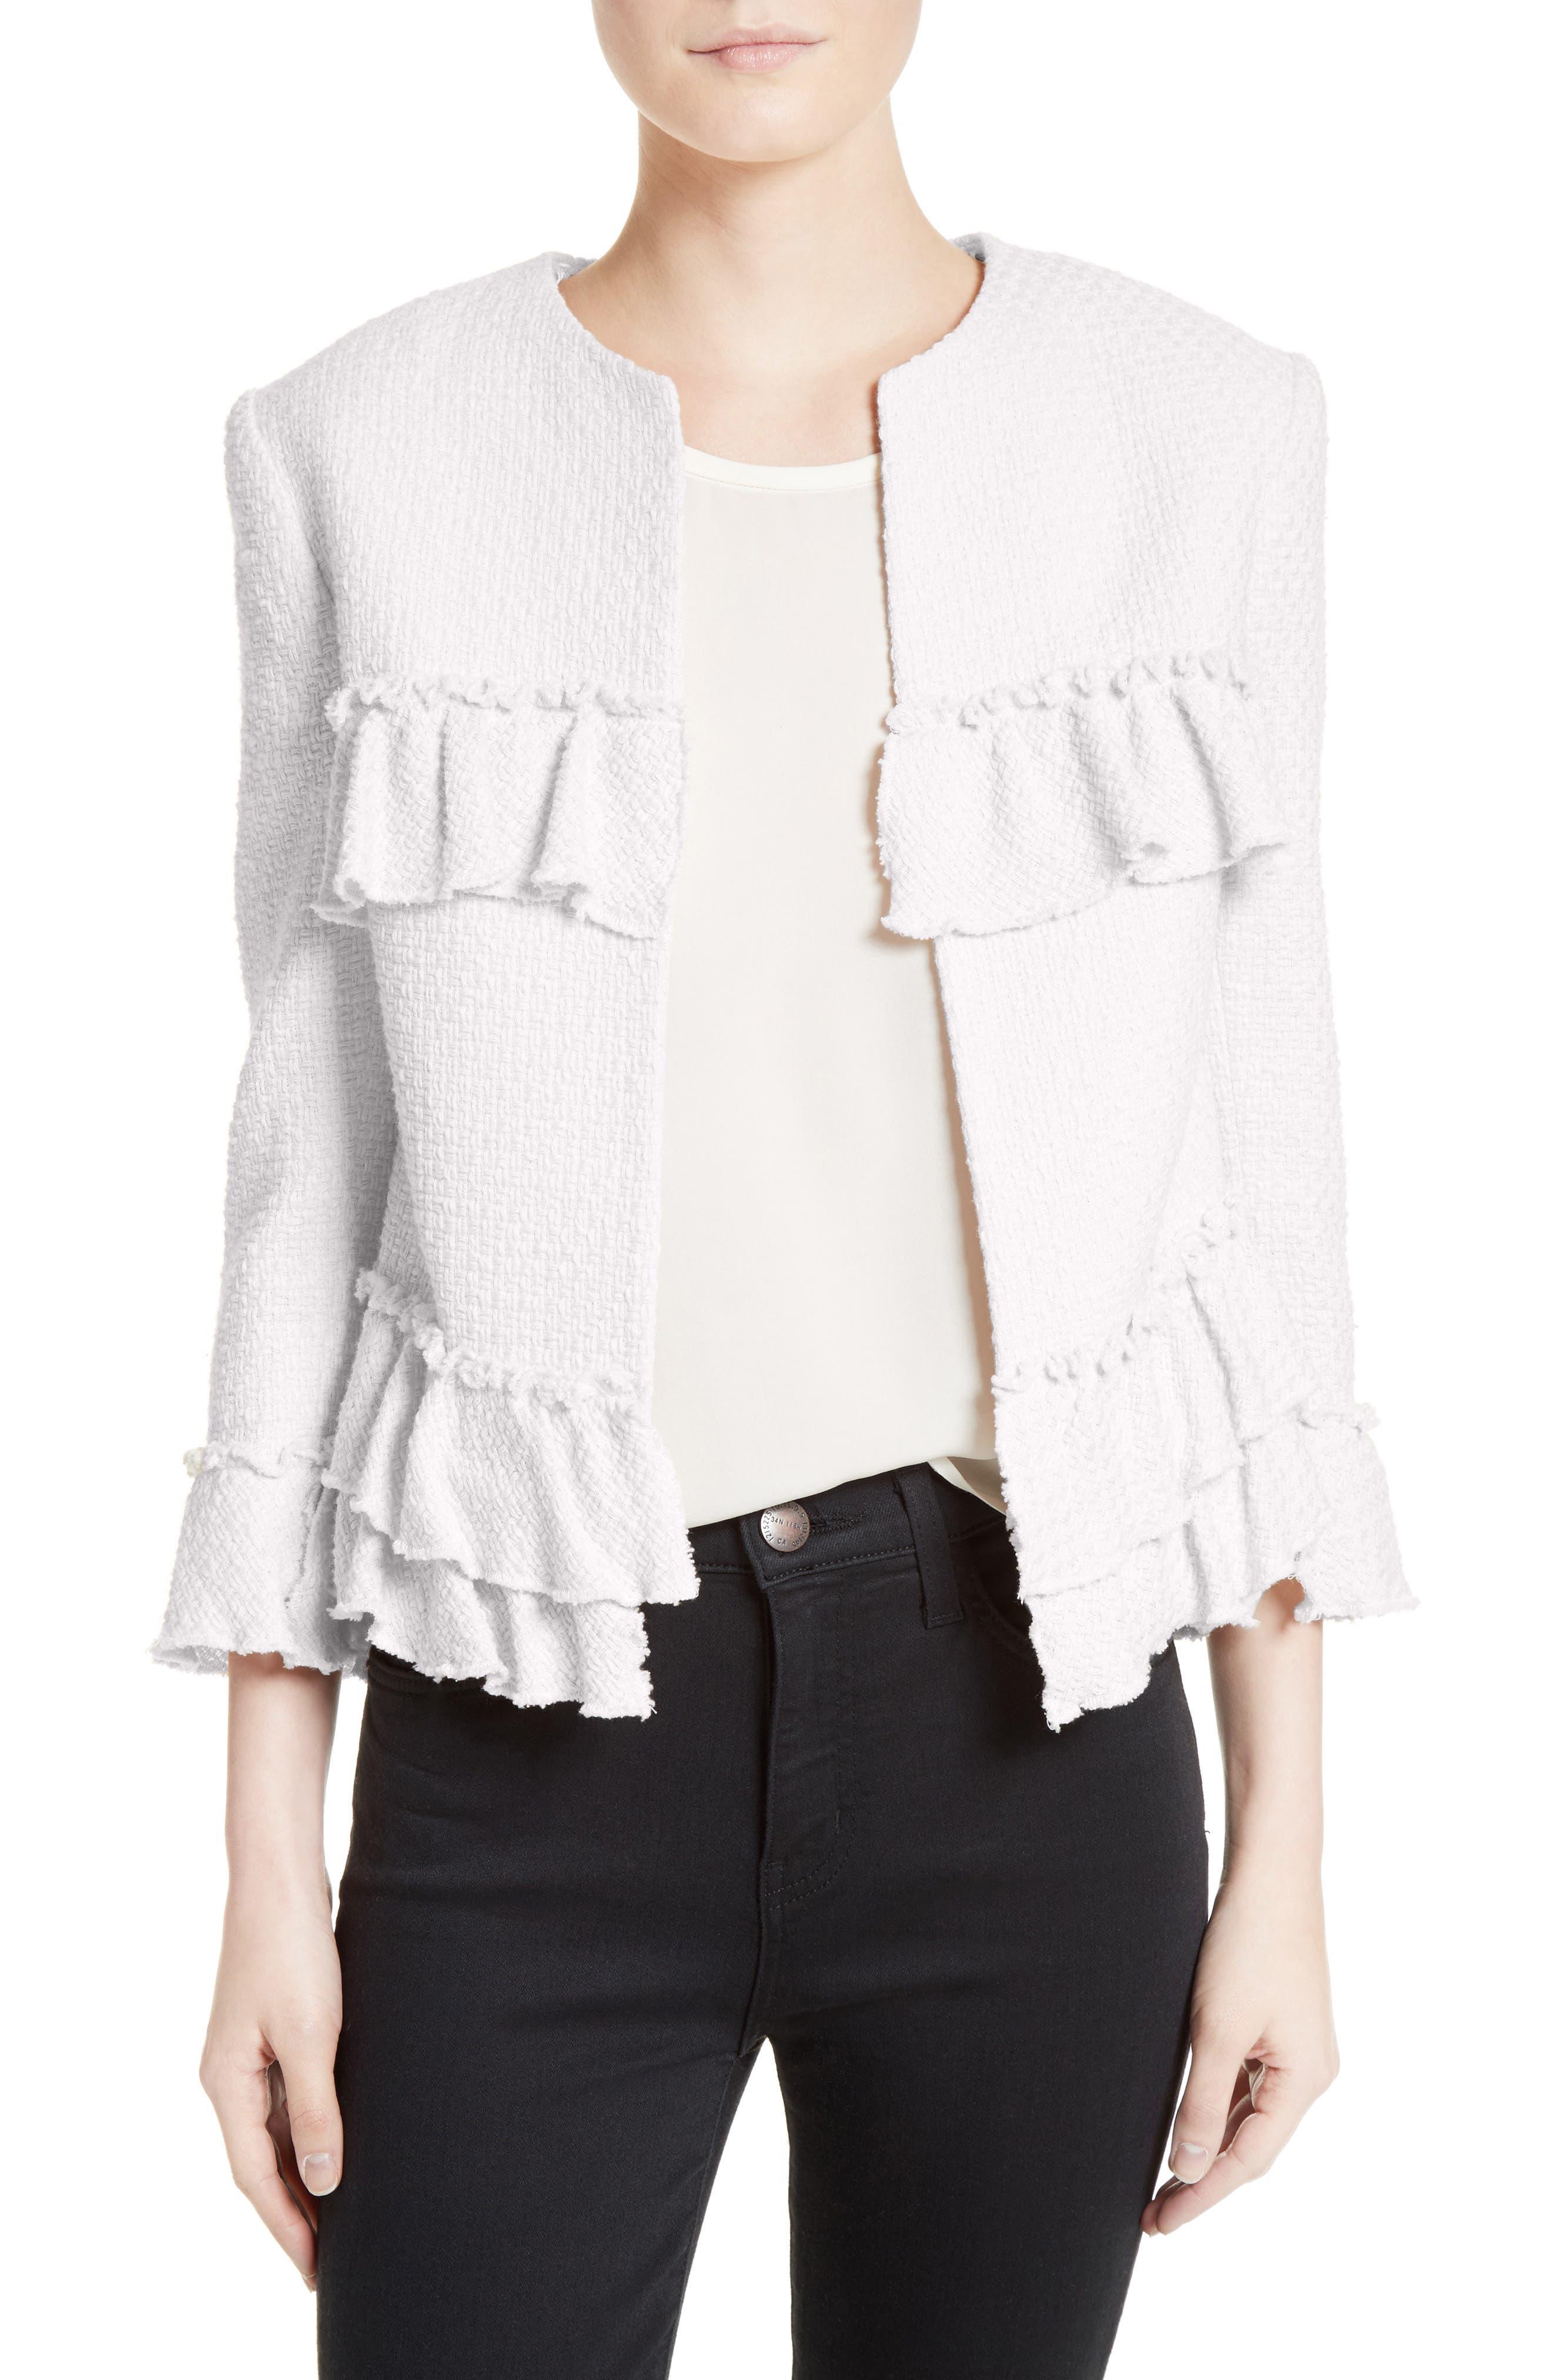 Helene Berman Frill Tweed Jacket